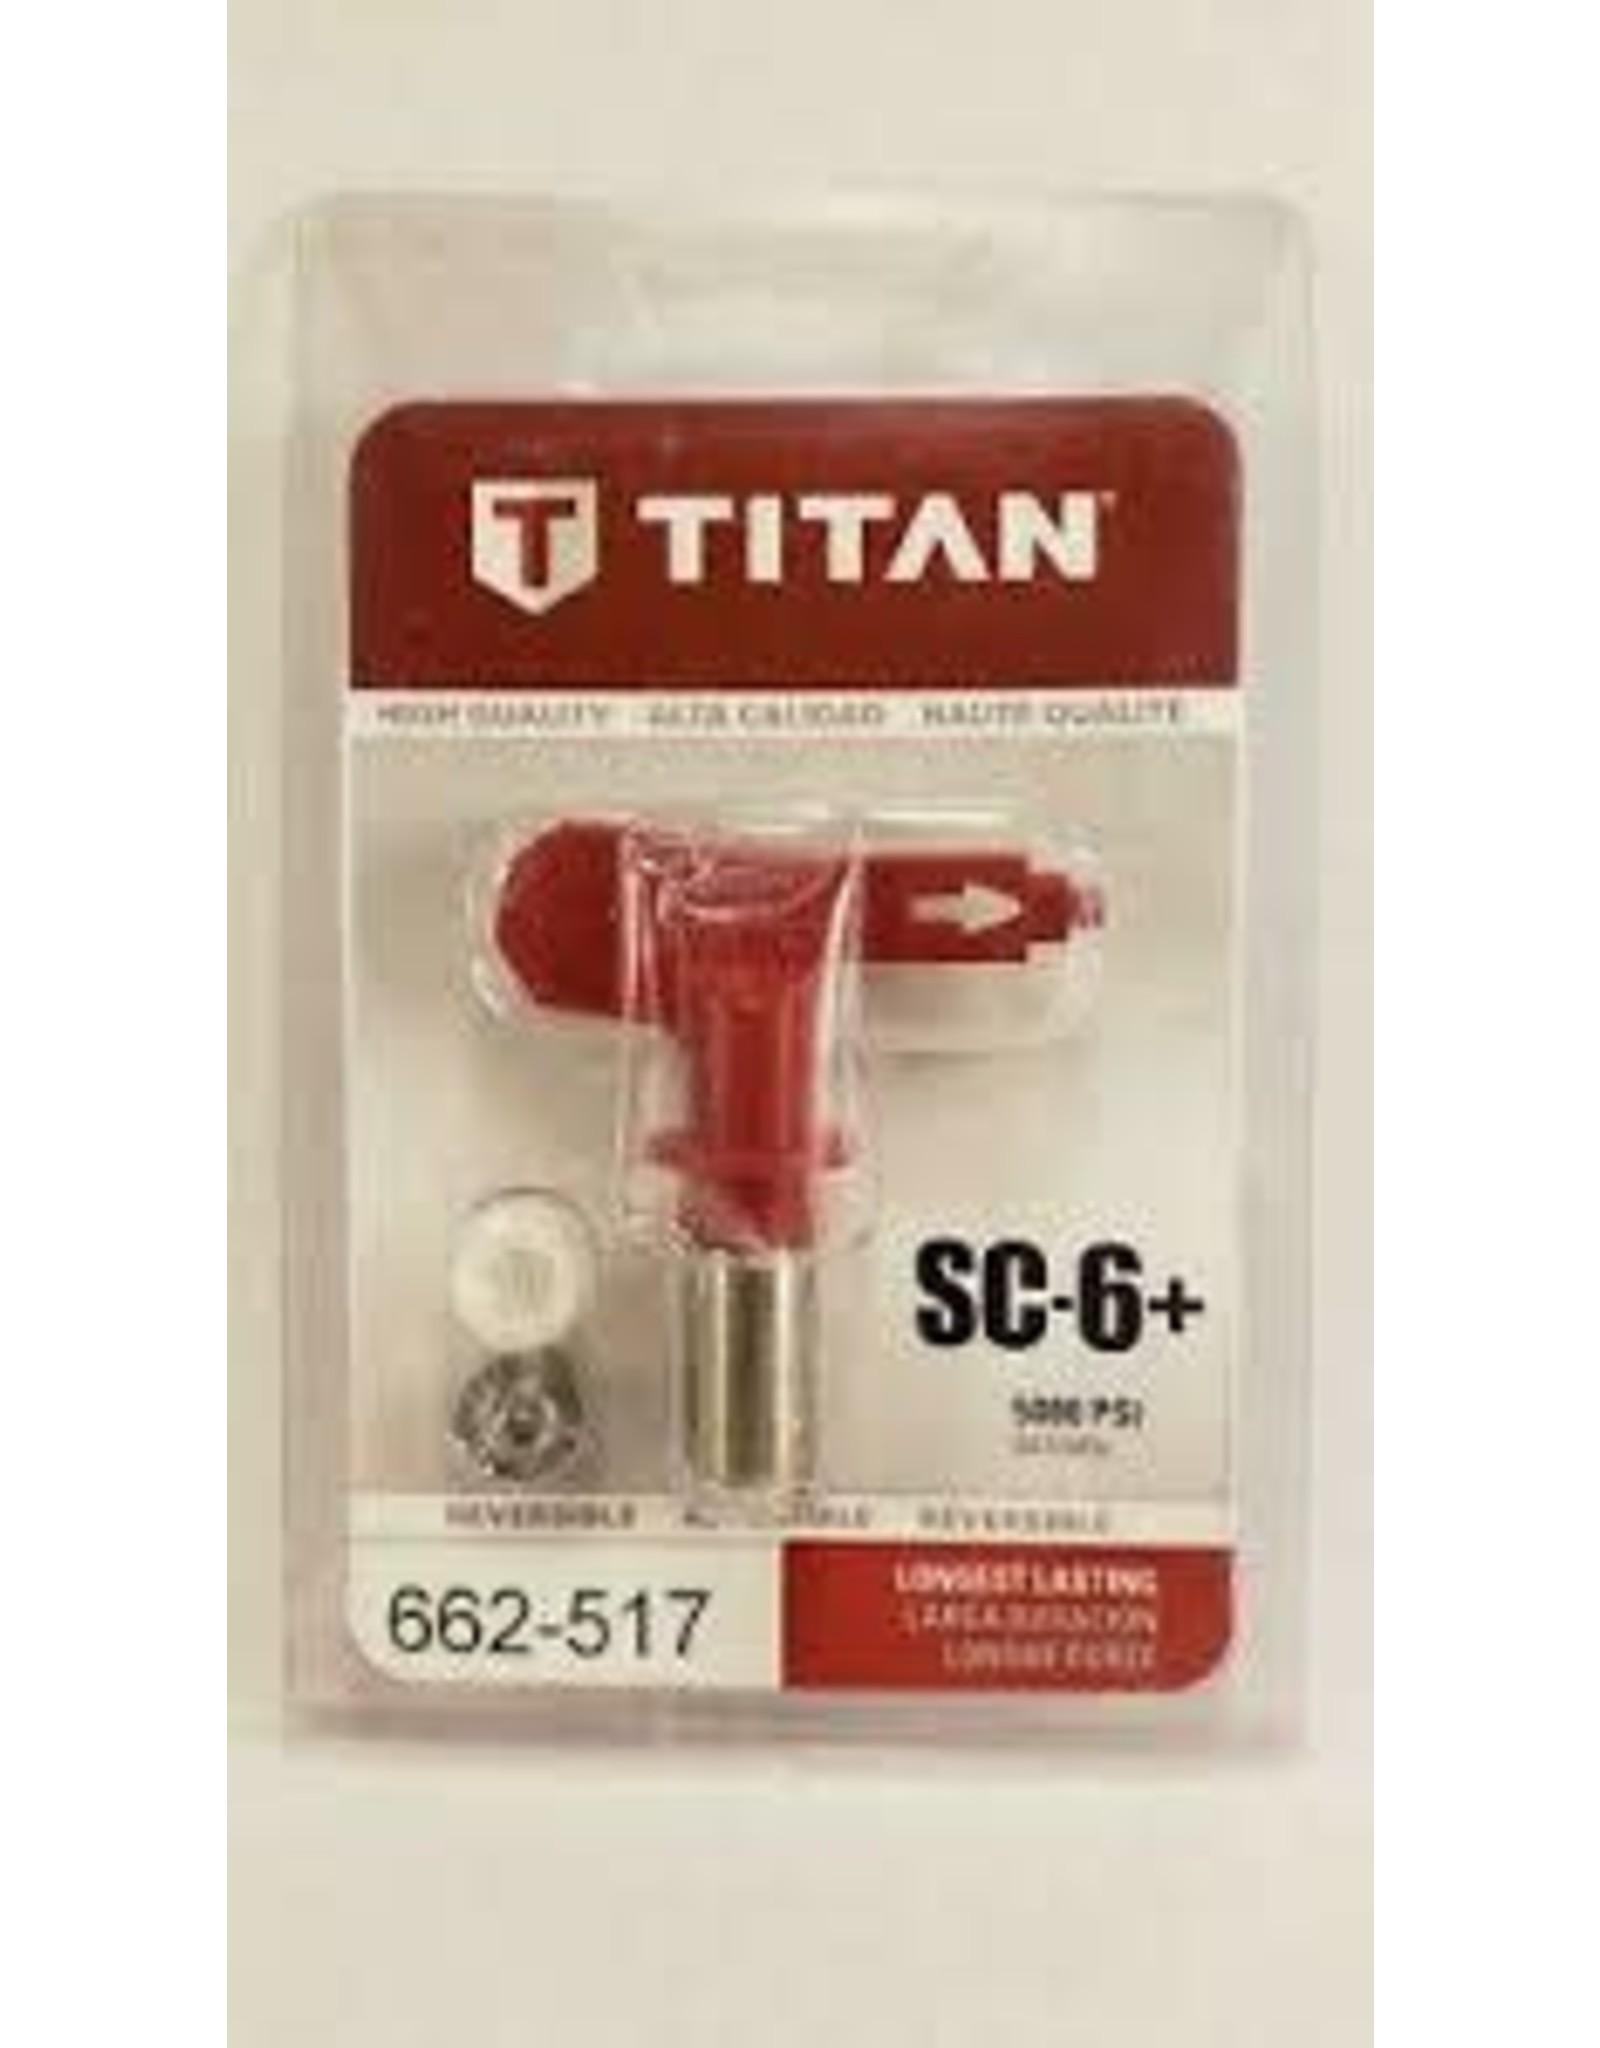 Titan 662-517 Titan Rev-Tip